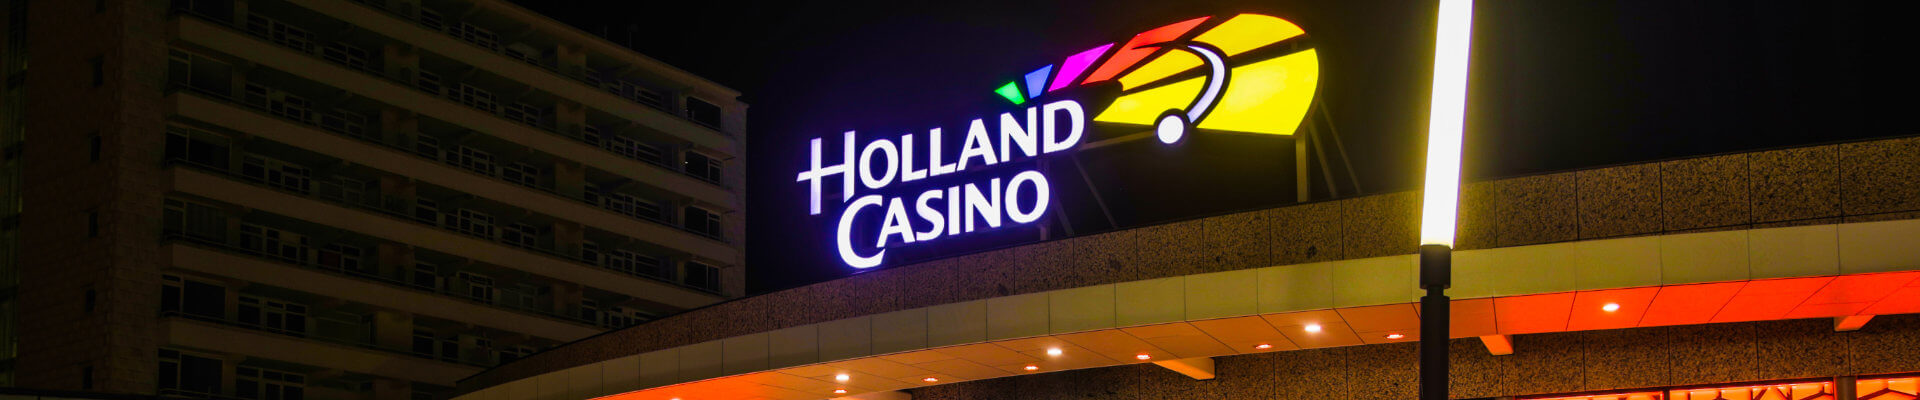 Holland Casino CS